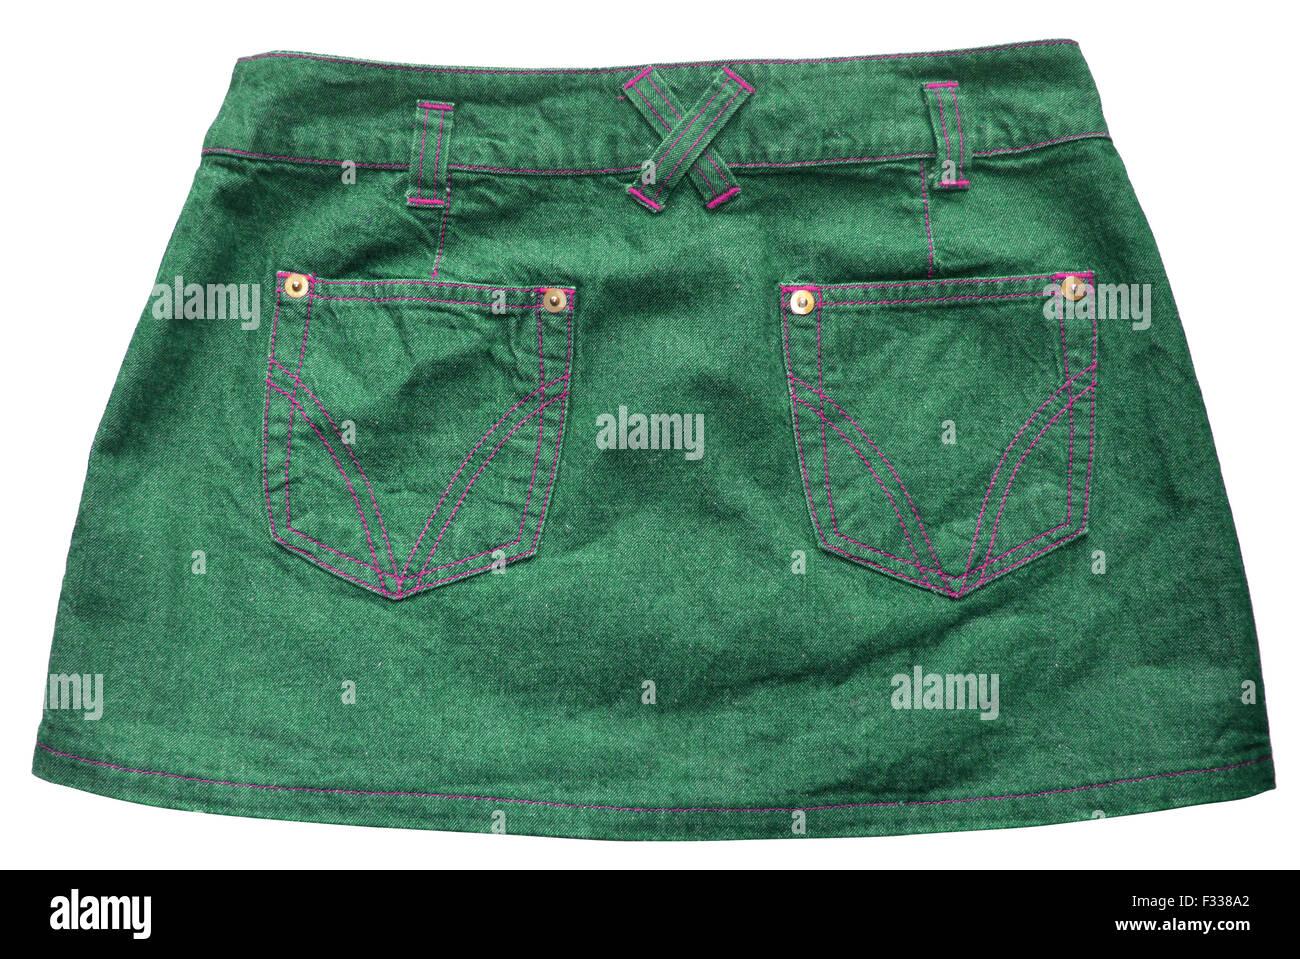 Green denim skirts - Stock Image